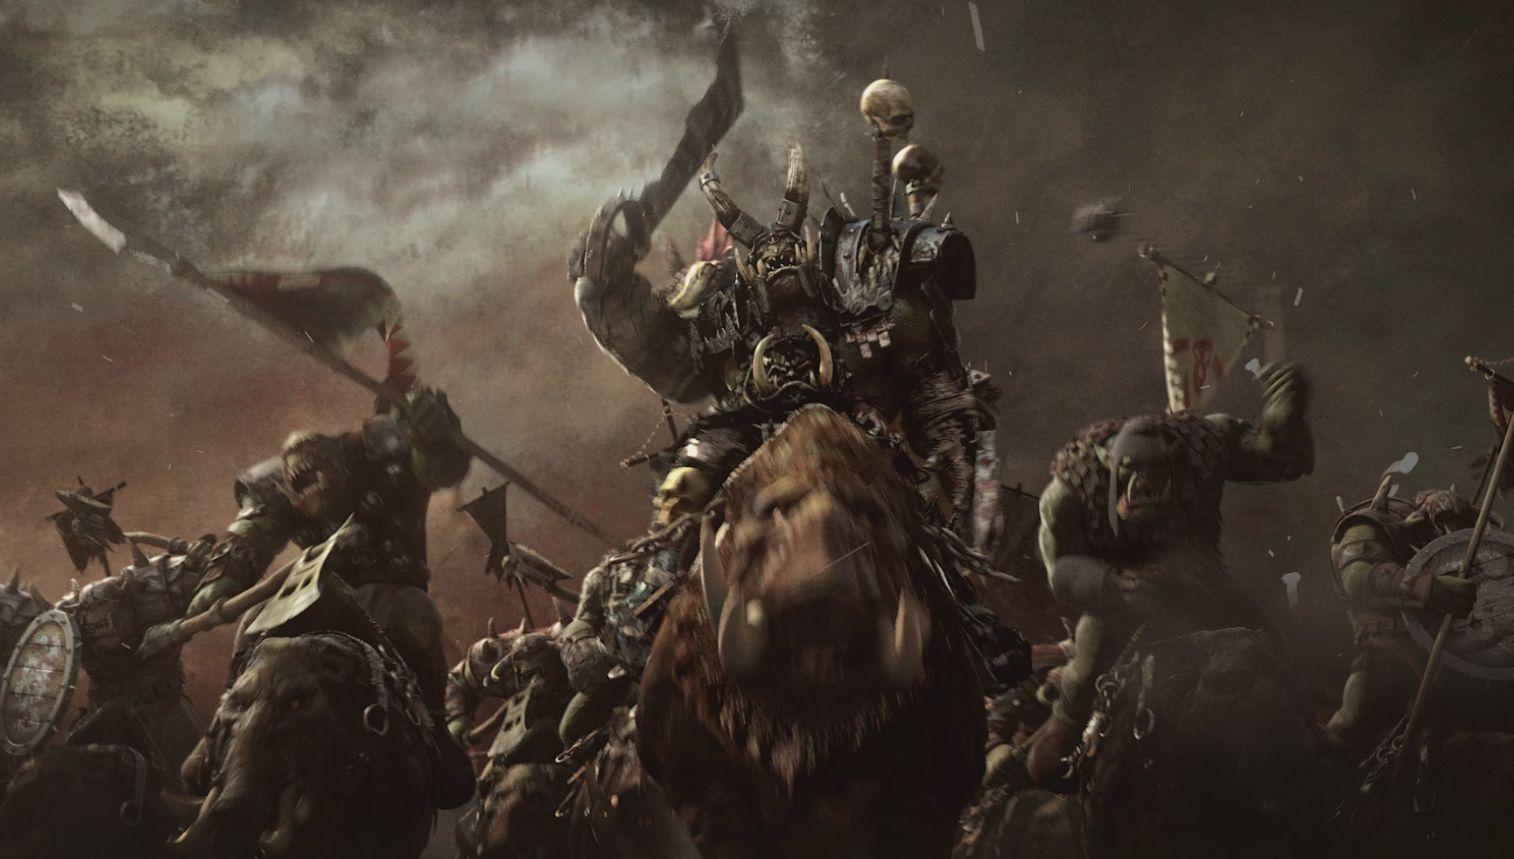 Game Of Thrones Quotes Desktop Wallpaper Total War Warhammer Toutes Les Factions Jouables Bitz